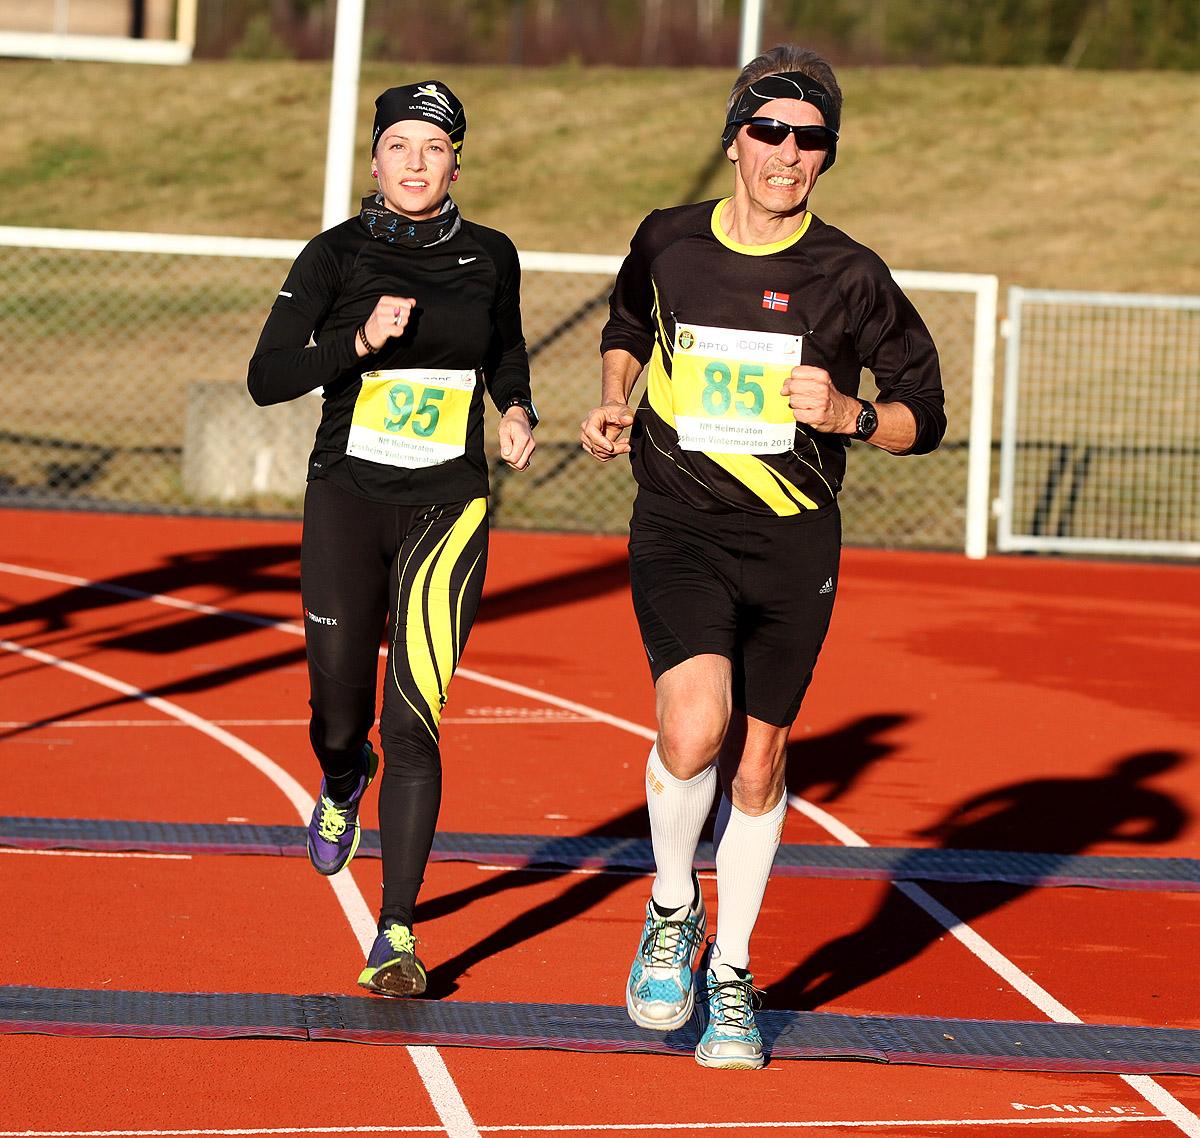 Vintermaraton2013_Therese-Falk_Erik-Nossum_31-5km.jpg